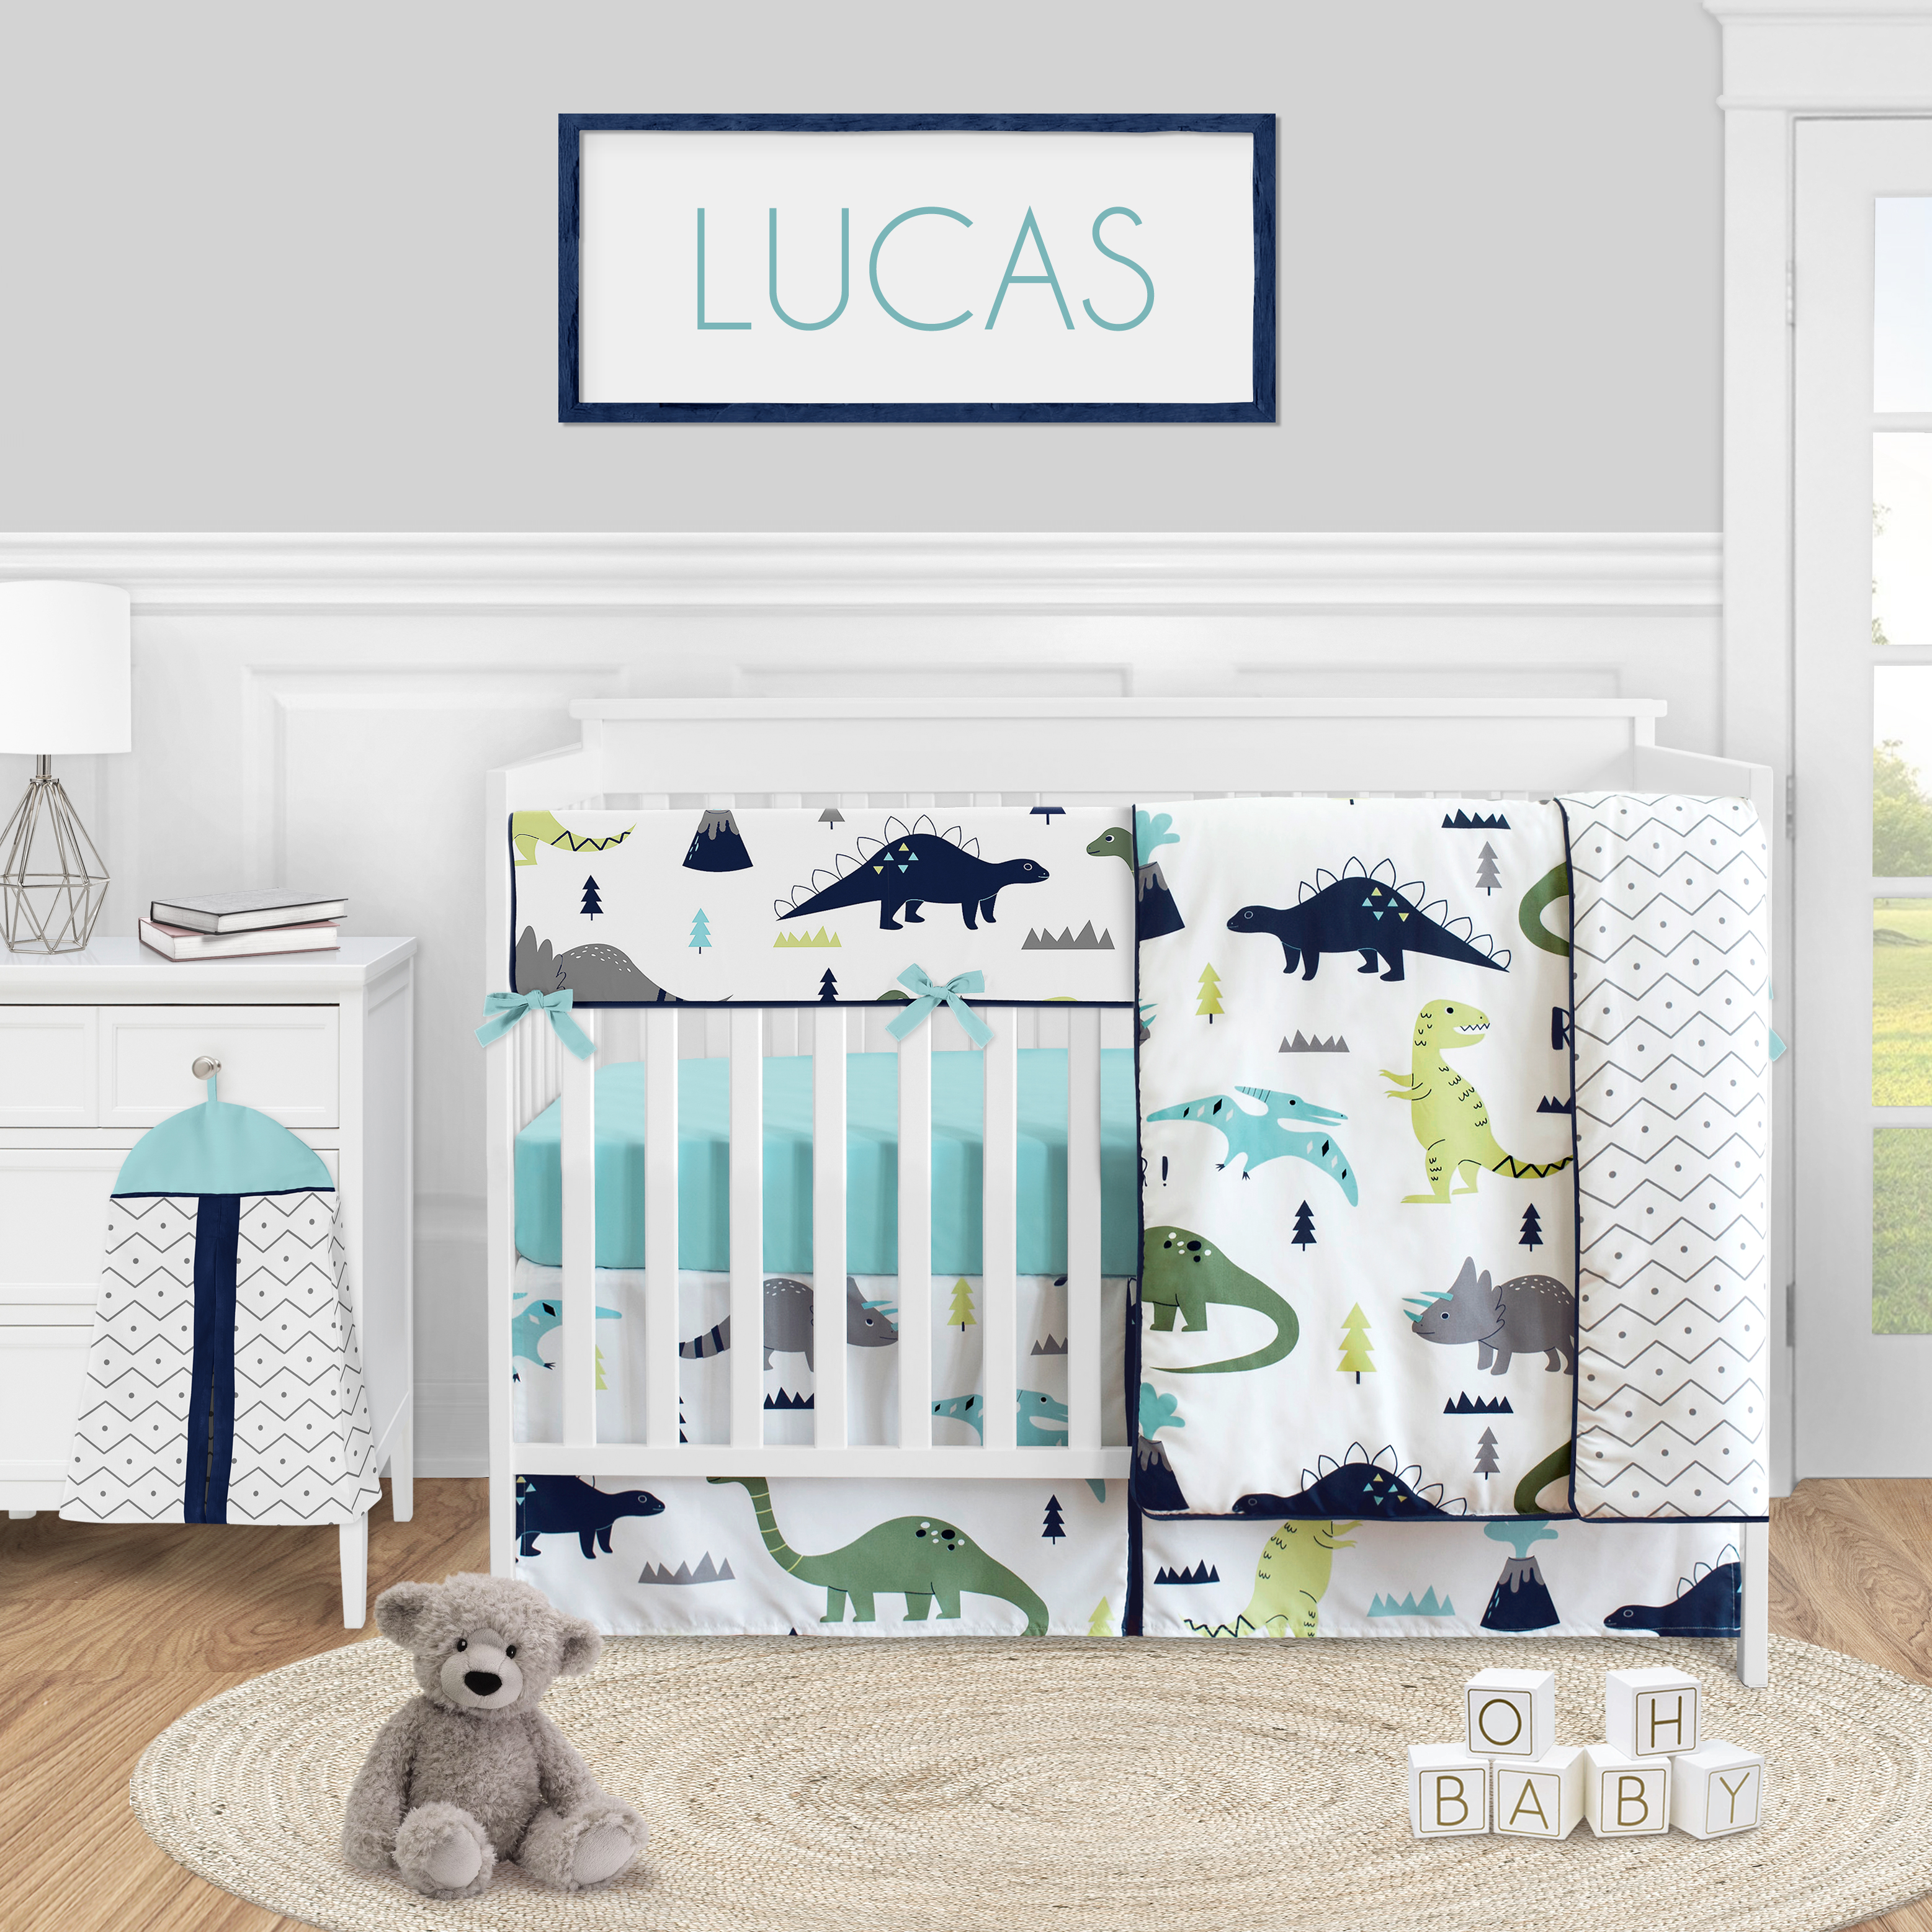 Sweet Jojo Designs Toddler Child Animal Print Microfiber Woven Bedding Sets Crib 5 Pieces Walmart Com